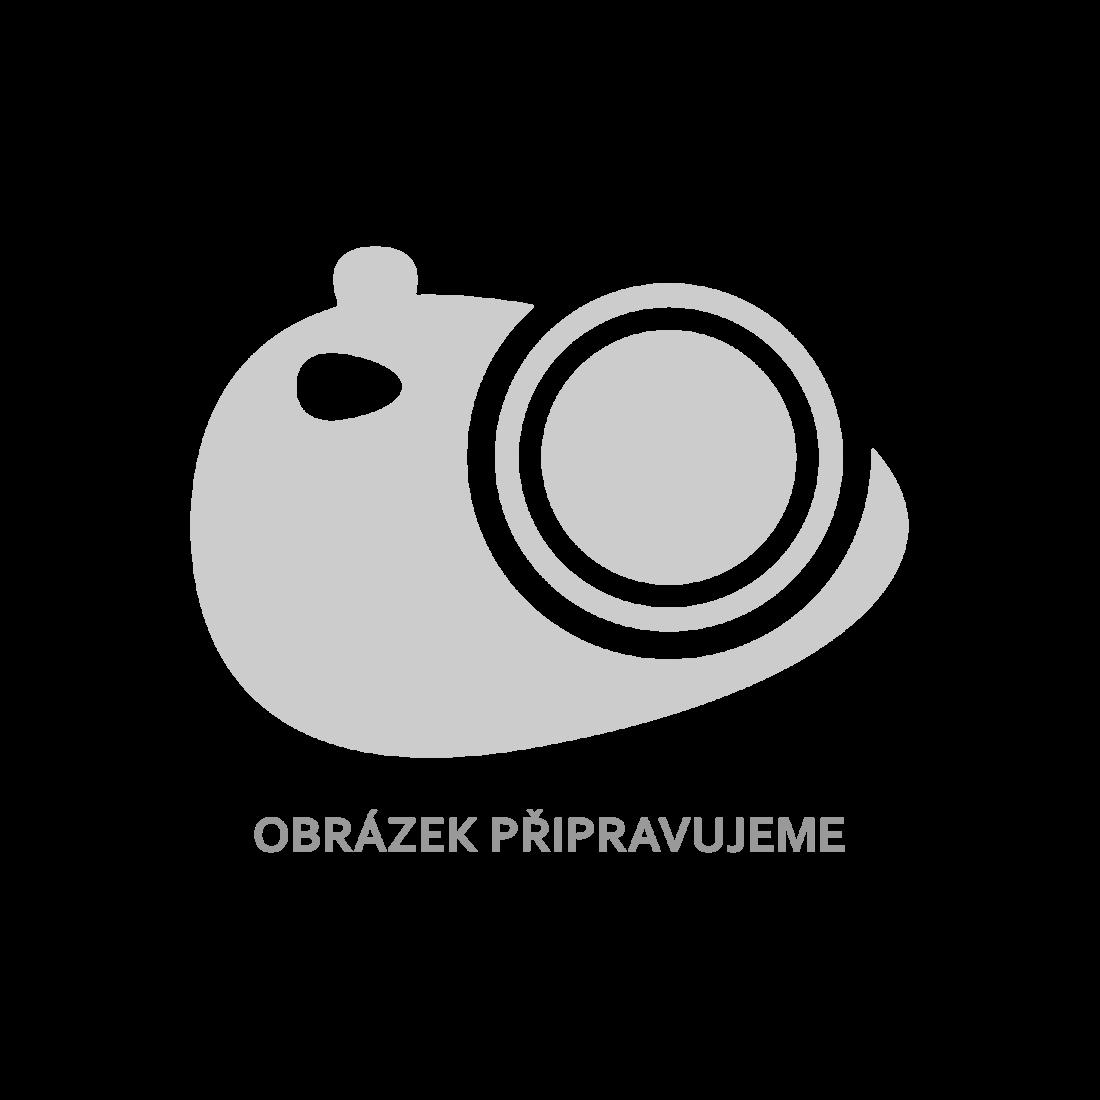 vidaXL Noční stolek, 2 ks, bambus, 60x60x40 cm, tmavě hnědý [244609]